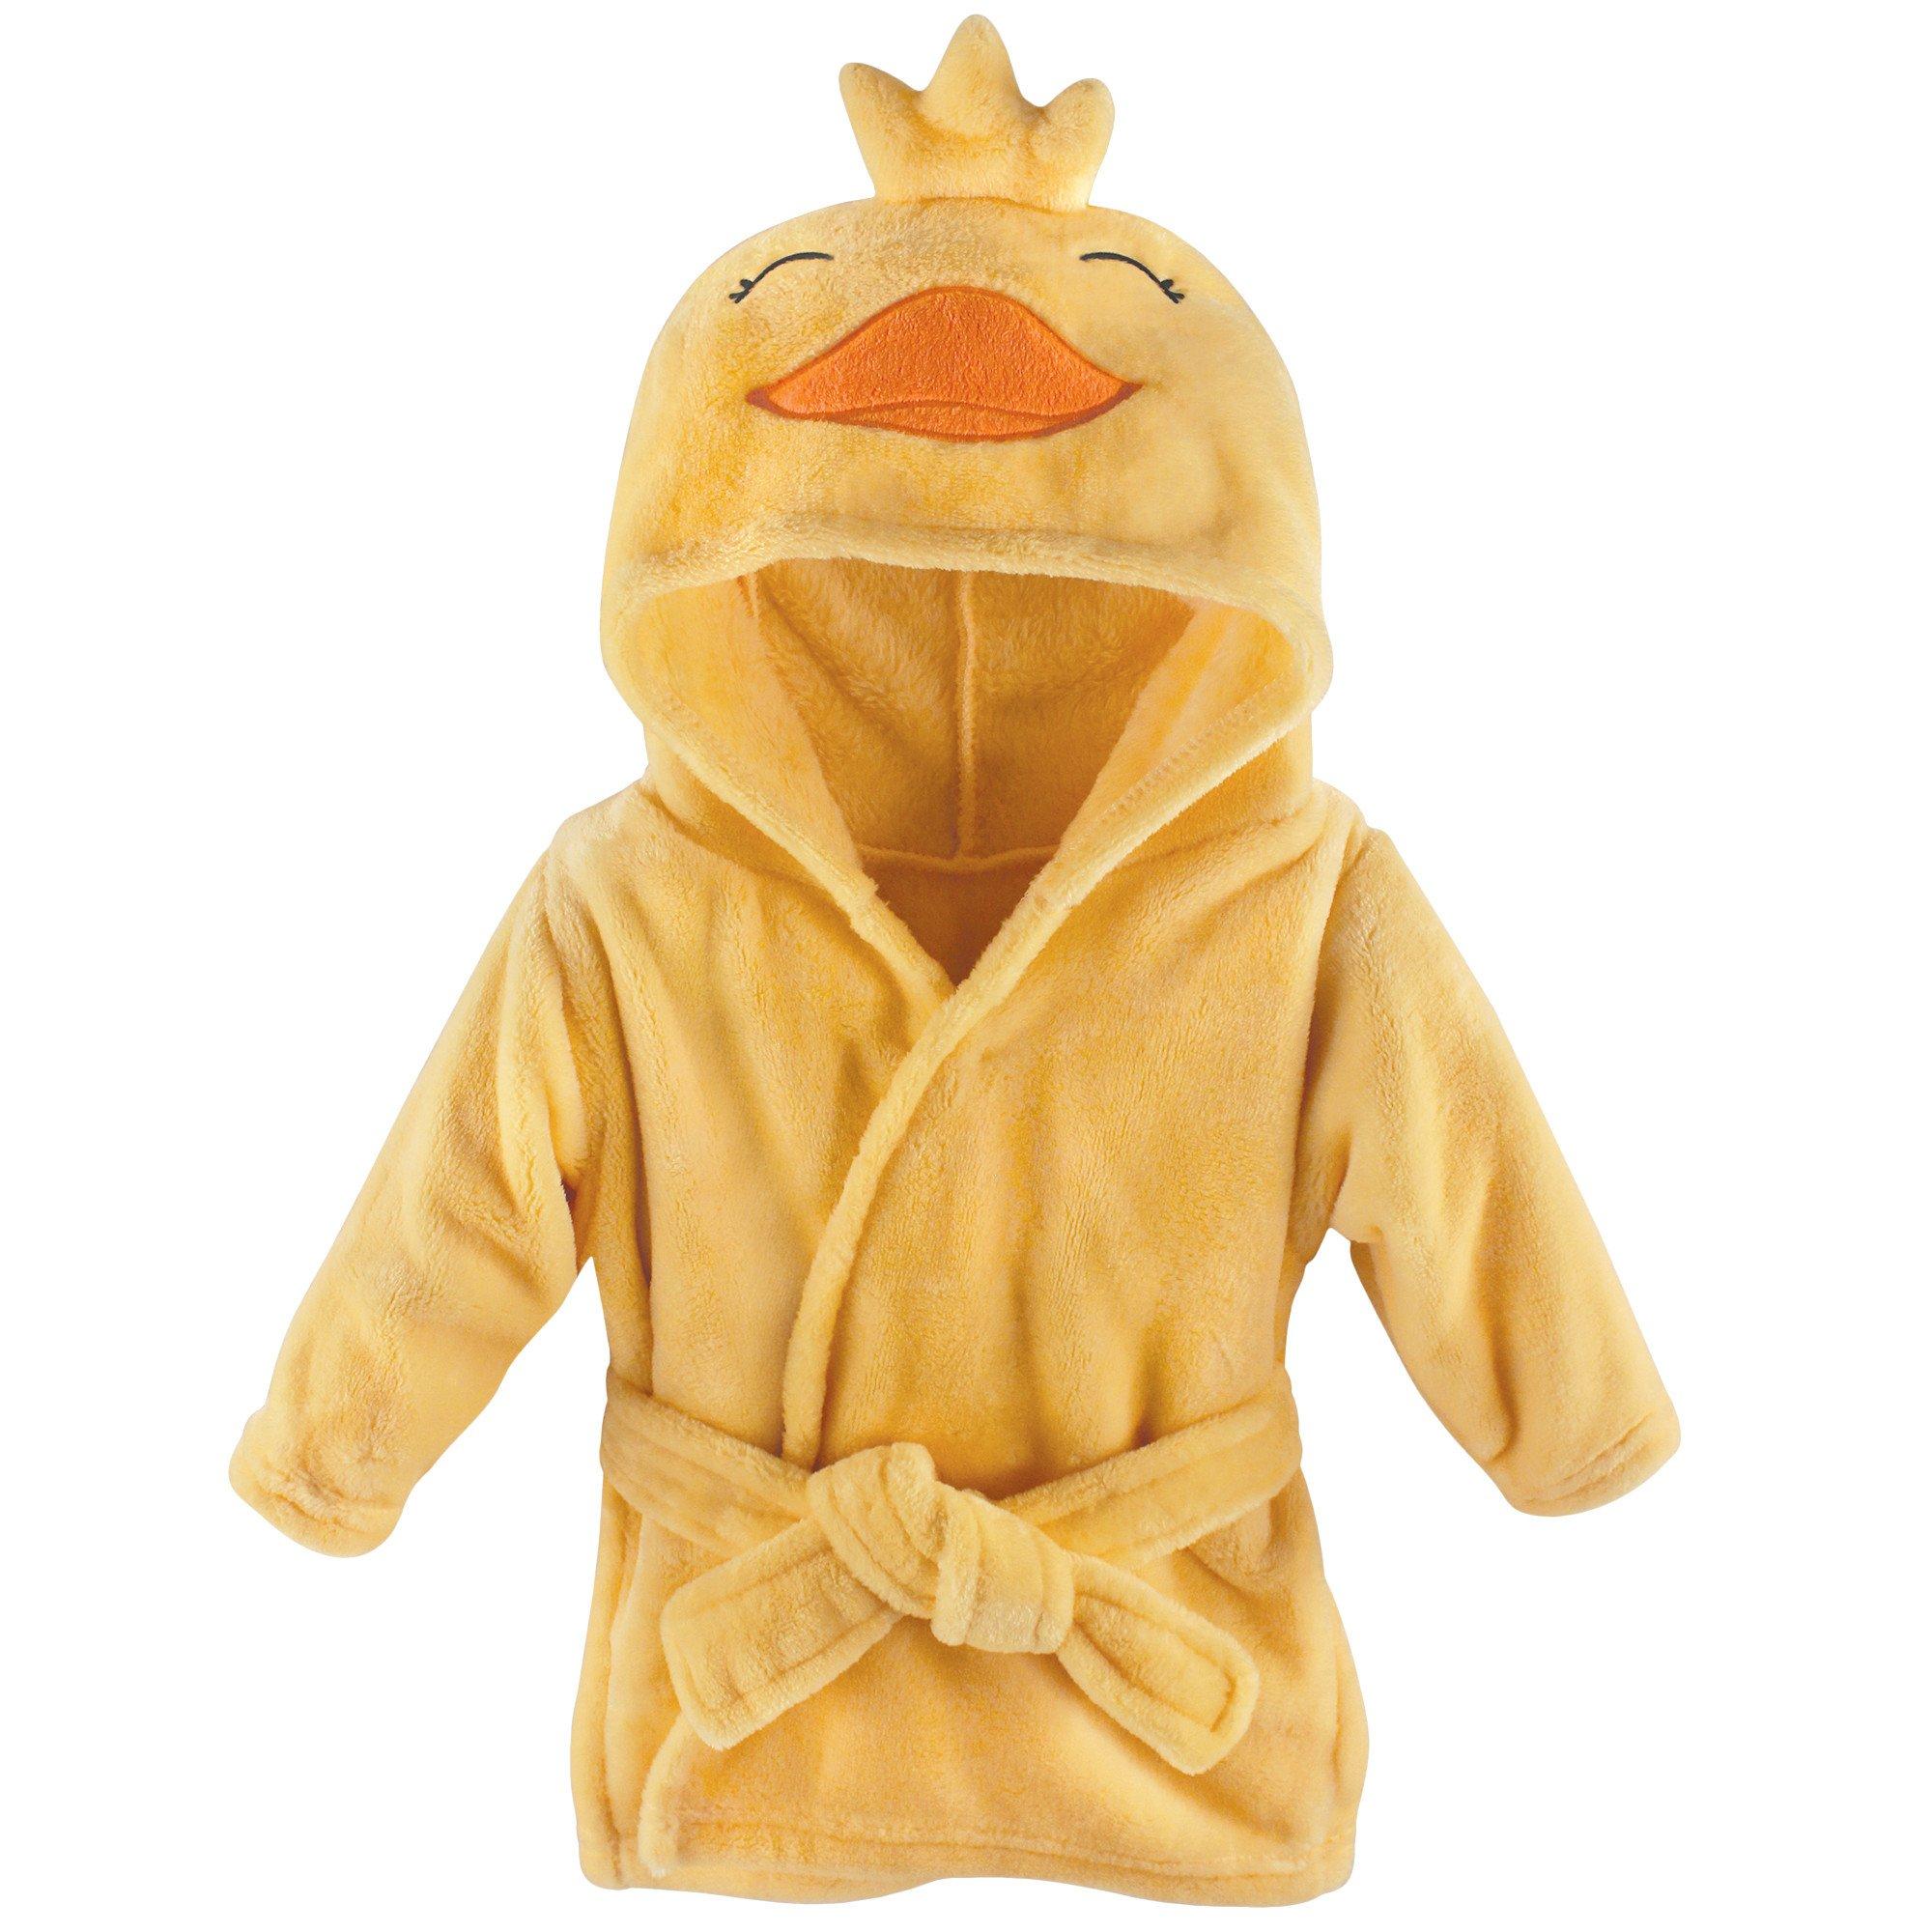 Hudson Baby Soft Plush Baby Bathrobe, Duck, 0-9 Months